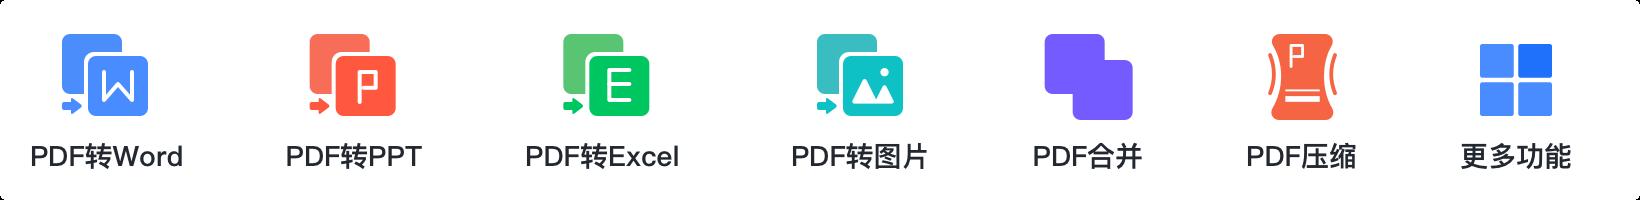 PDF文章上方广告位